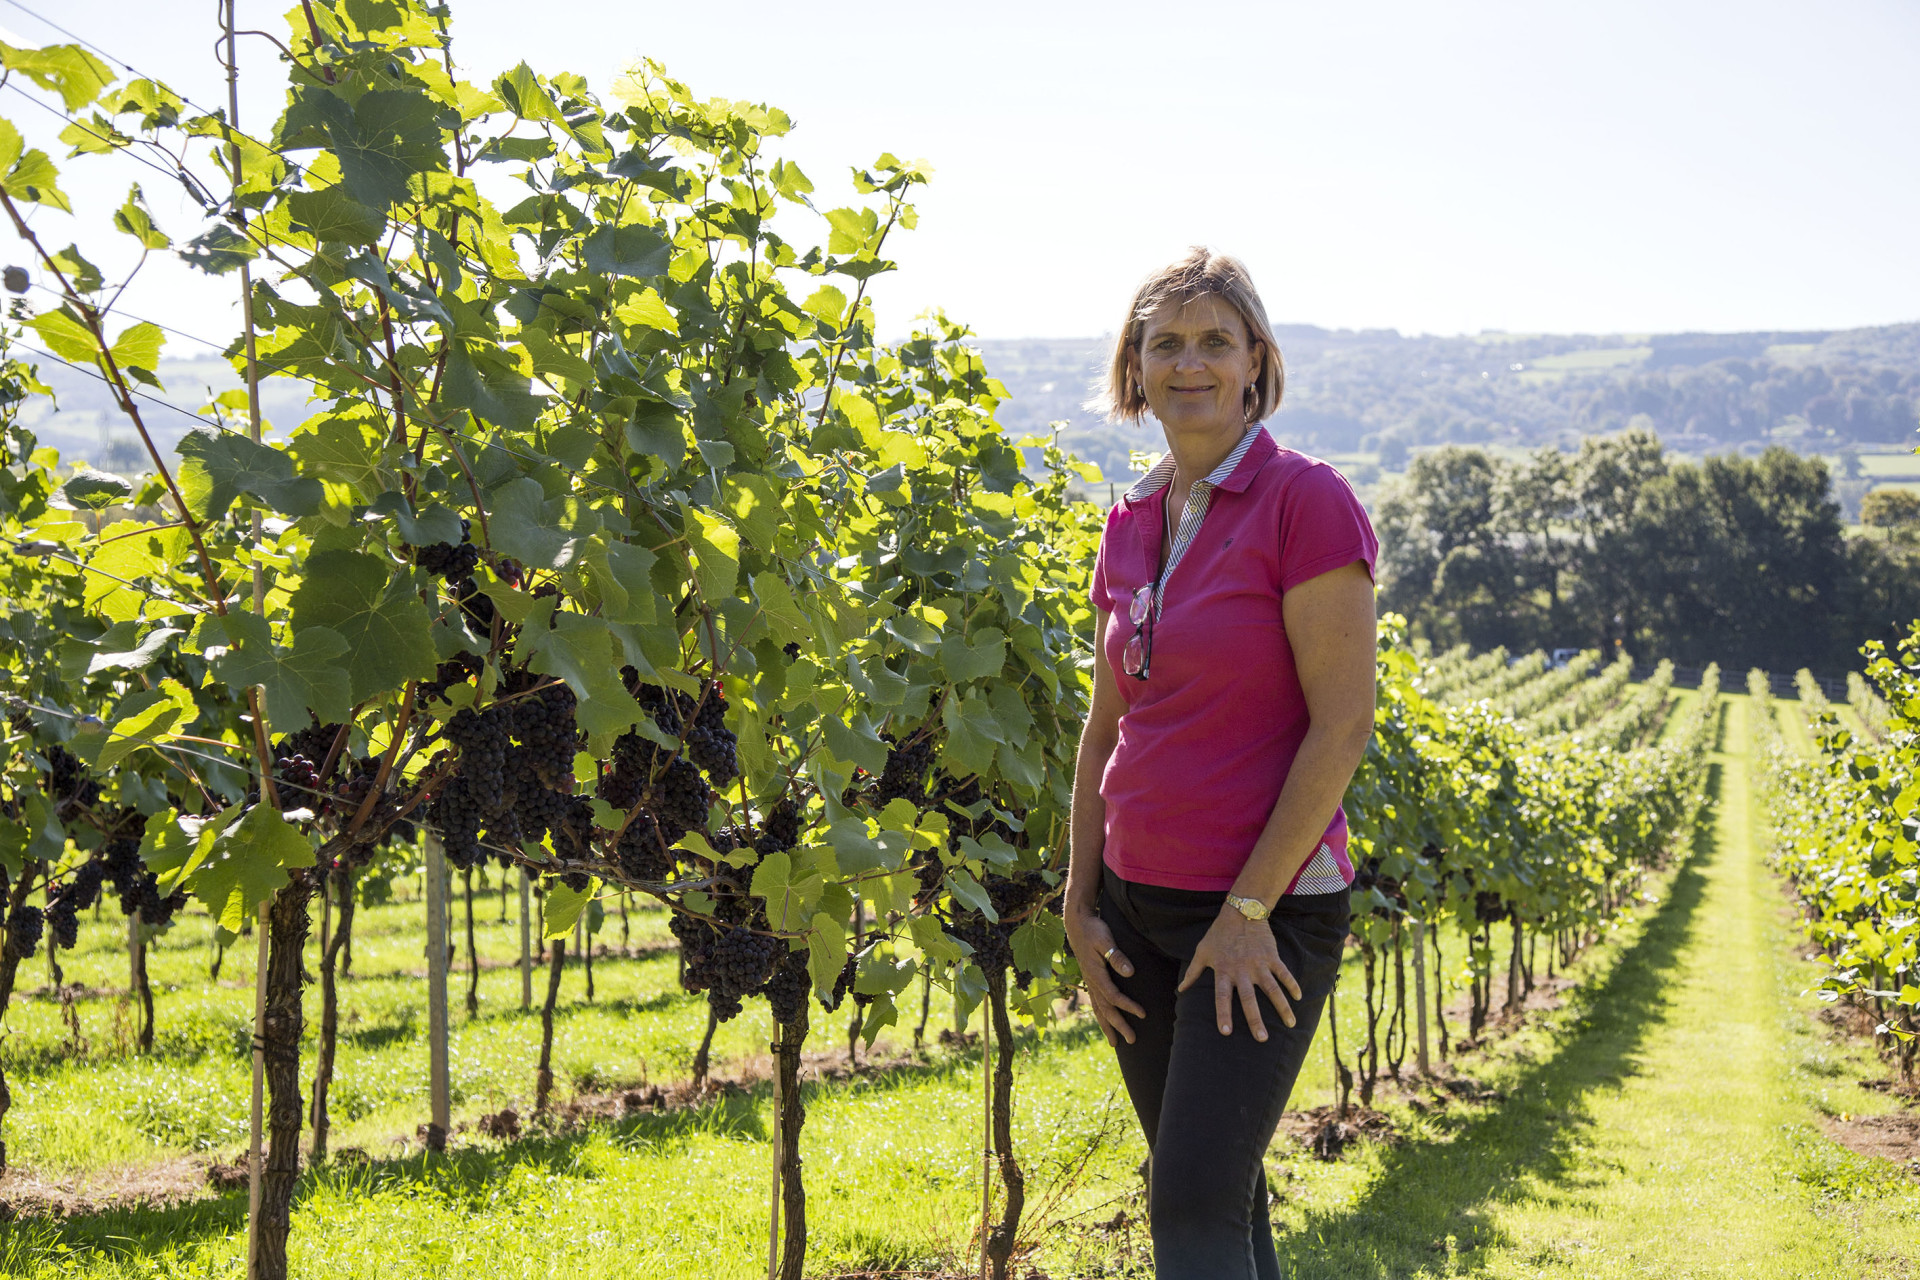 Vineyard Aldwick, English wine